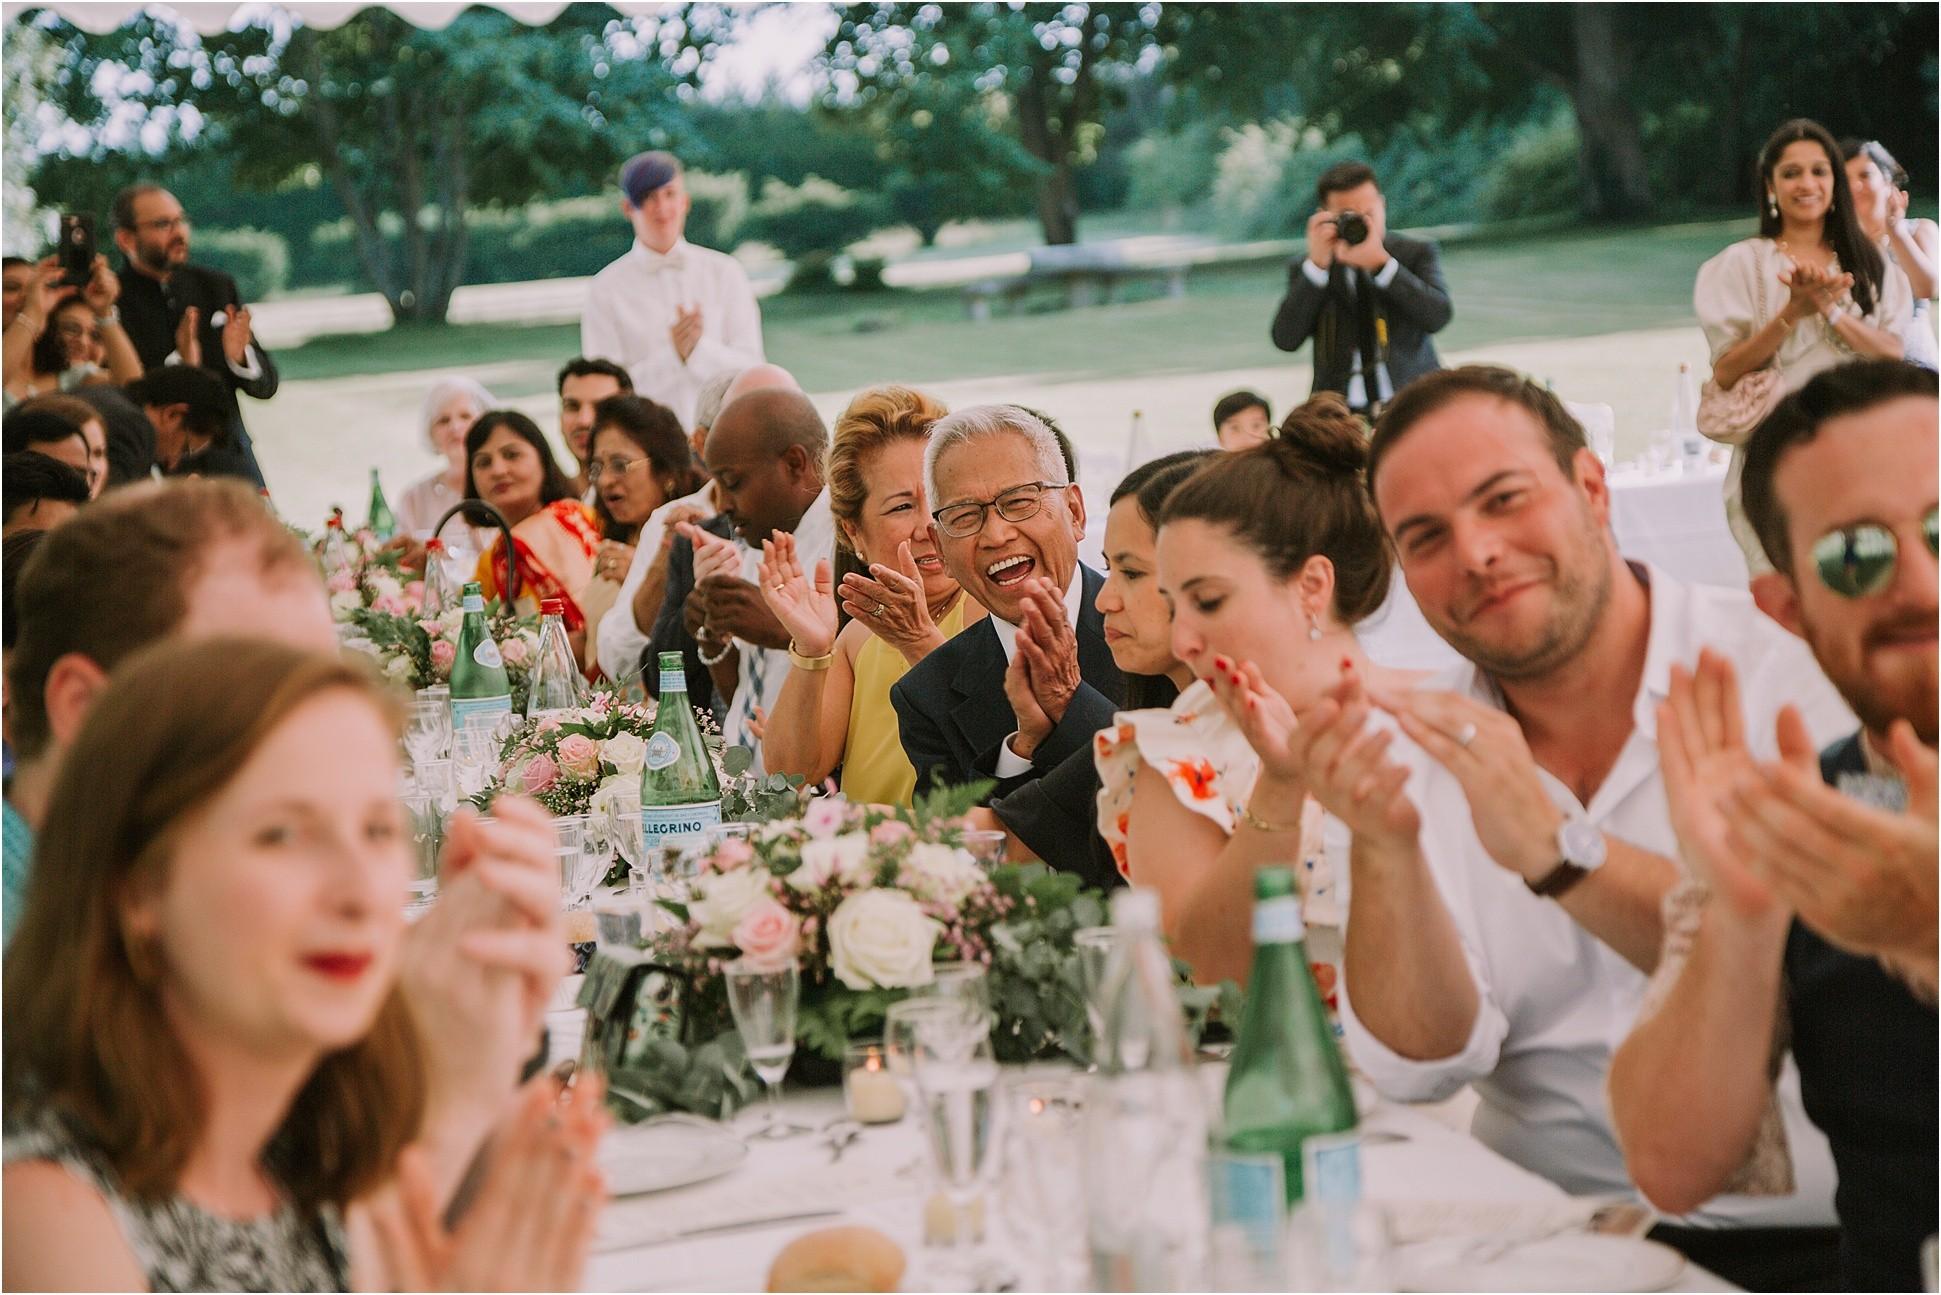 Kateryna-photos-photographe-mariage-chateau-st-paterne-mayenne-normandie_0133.jpg